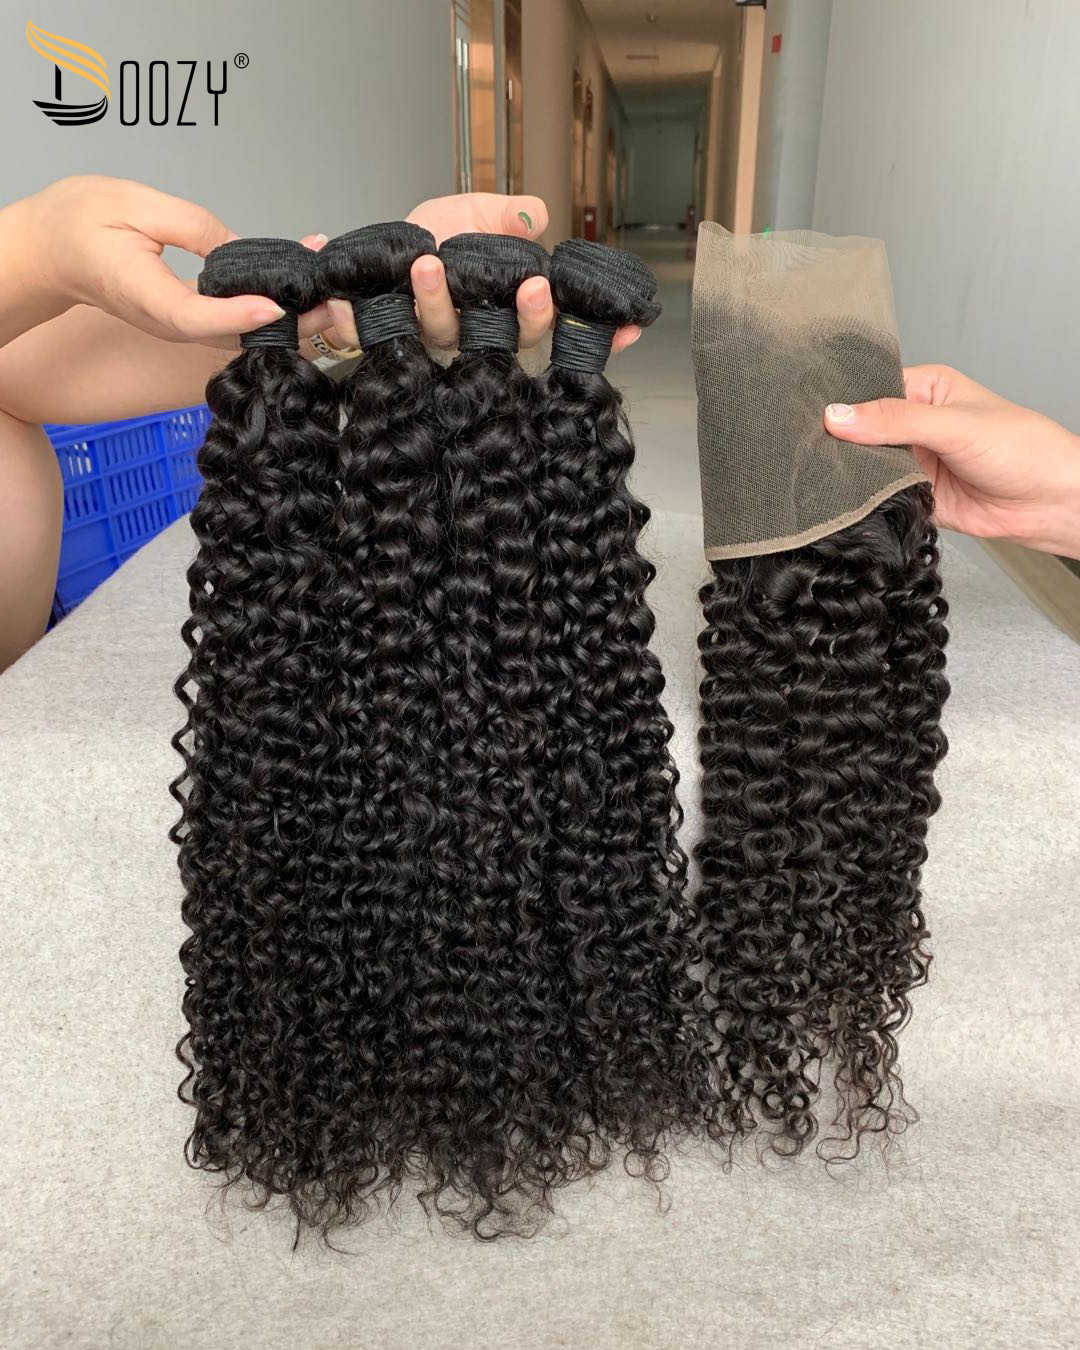 Doozy Hair Brazilian Virgin Hair 4 Bundles With Frontal Deep Curly Human Hair